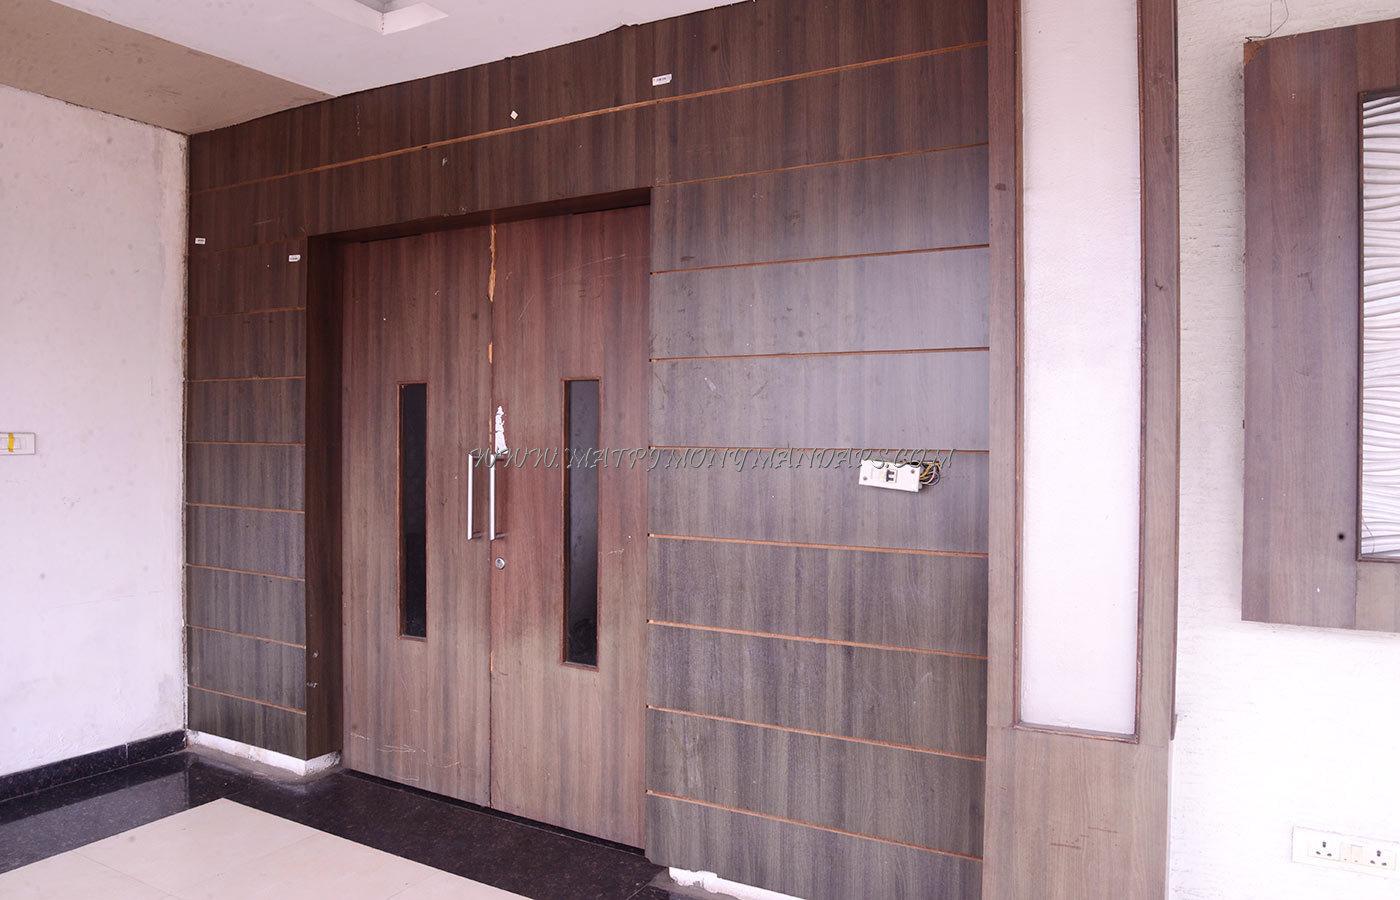 SMS Hotel Hall 1 - Entrance